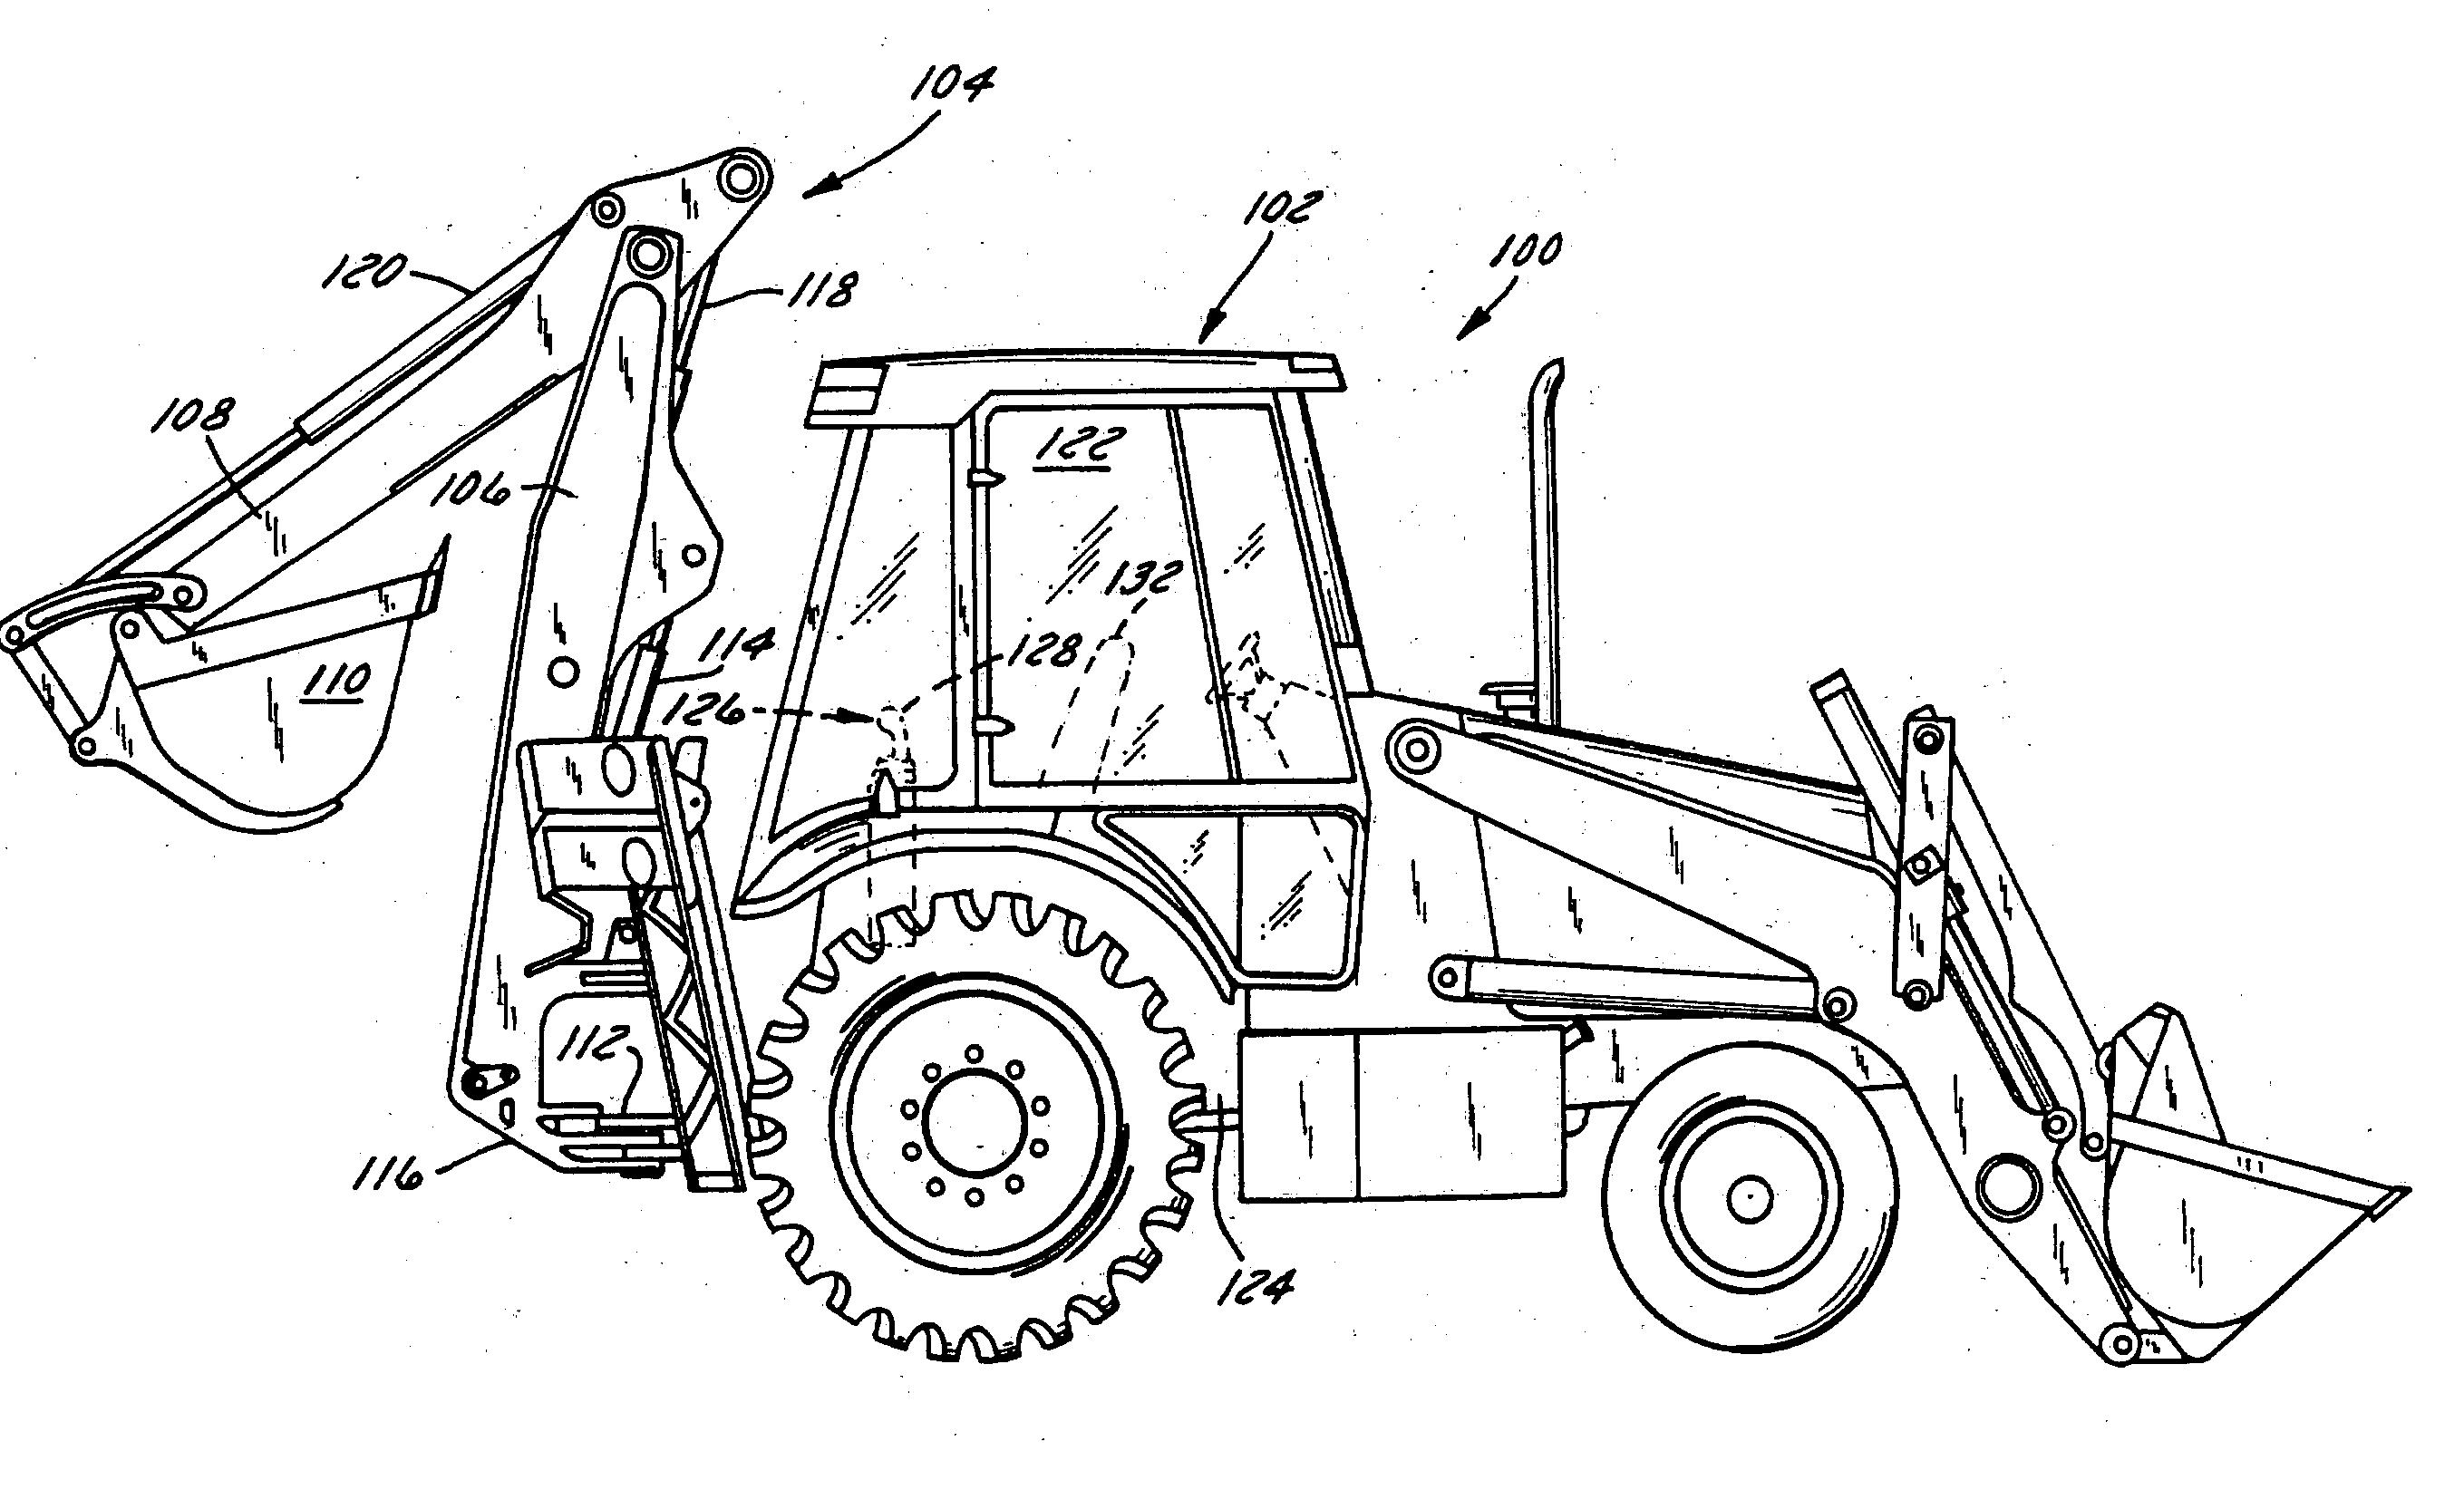 Patent US20040261300 - Modular Backhoe-excavator Control Station - Google Patents